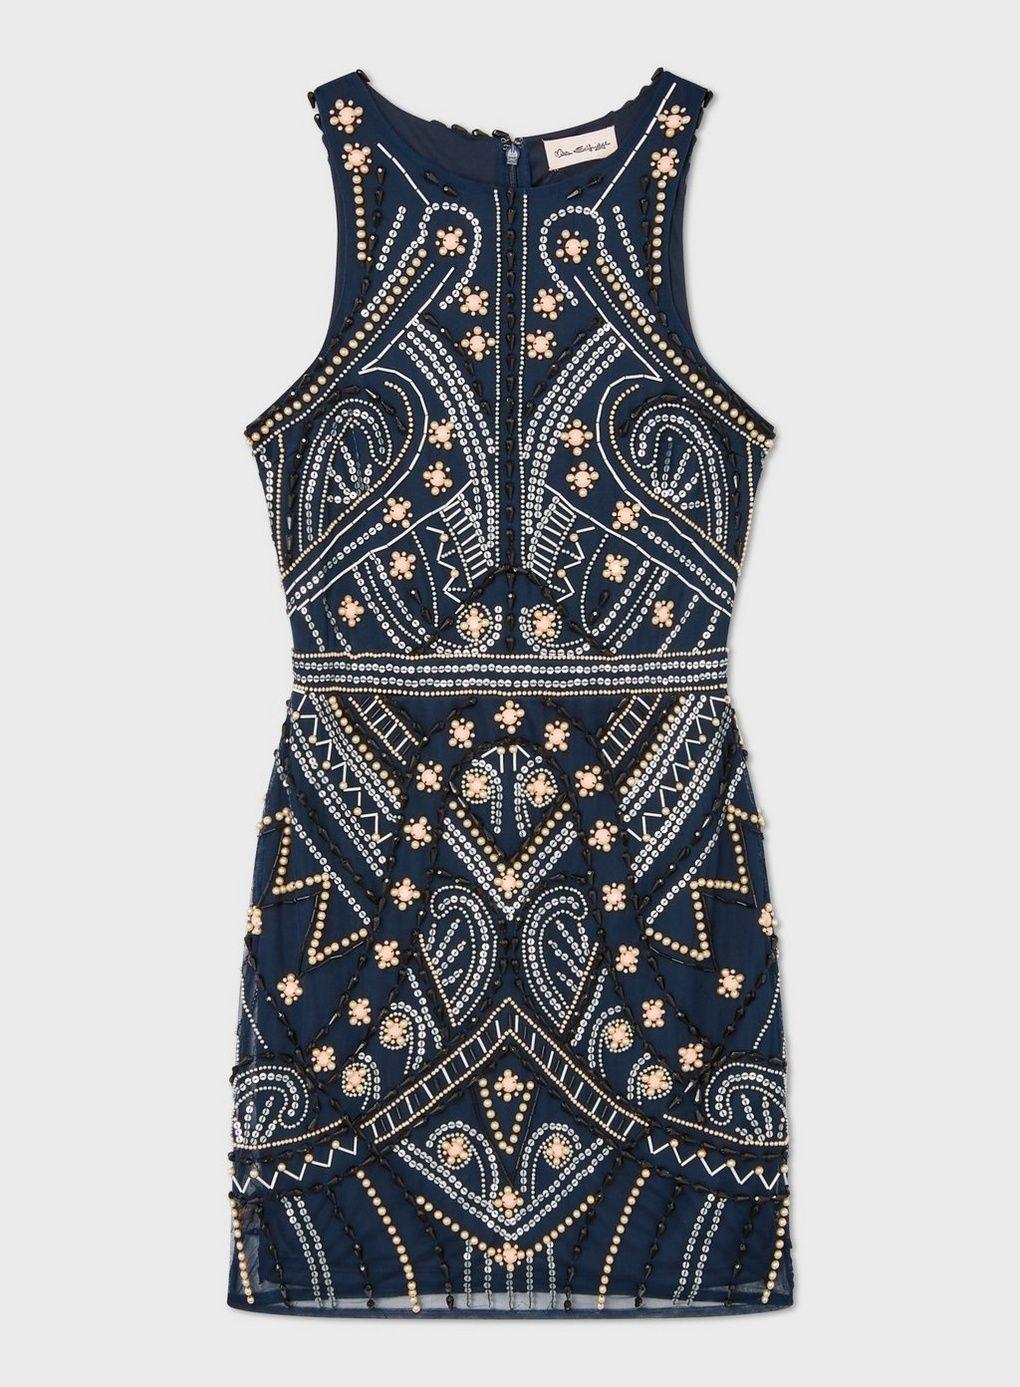 Navy Sleeveless Beaded Mini Dress - Dresses - Clot in 2020 ...